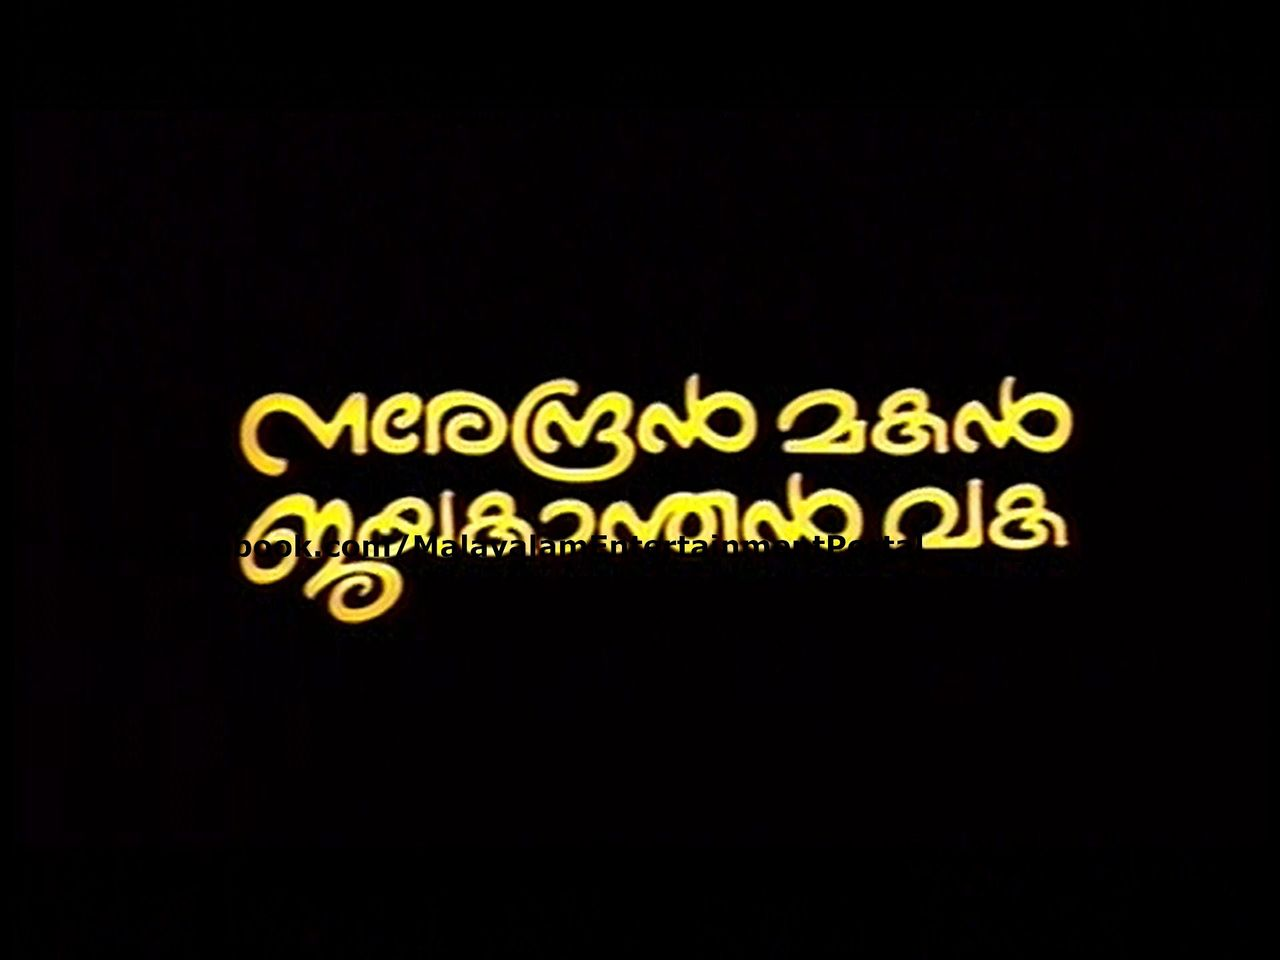 Narendran Makan Jayakanthan Vaka DVD Screenshots (Saina) Bscap0001